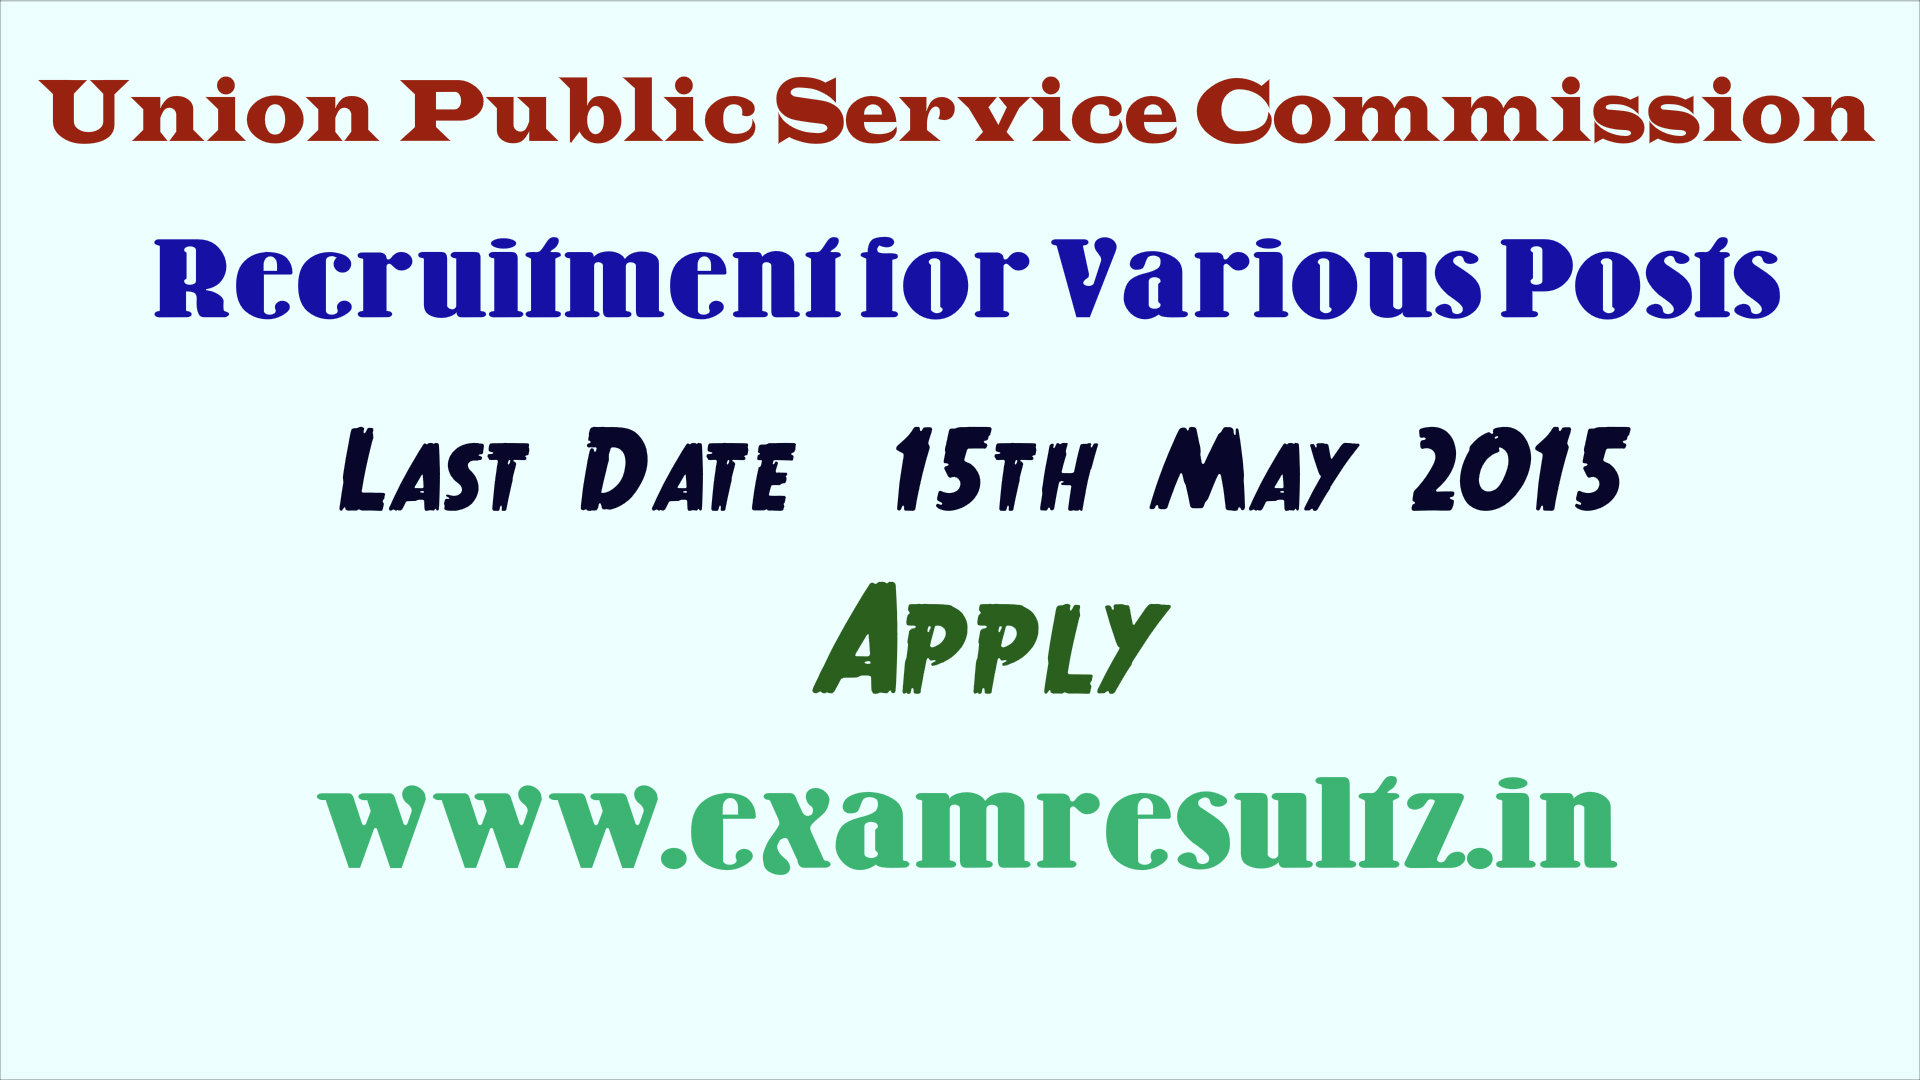 UPSC recruitment online application form www.upsconline.nic.in